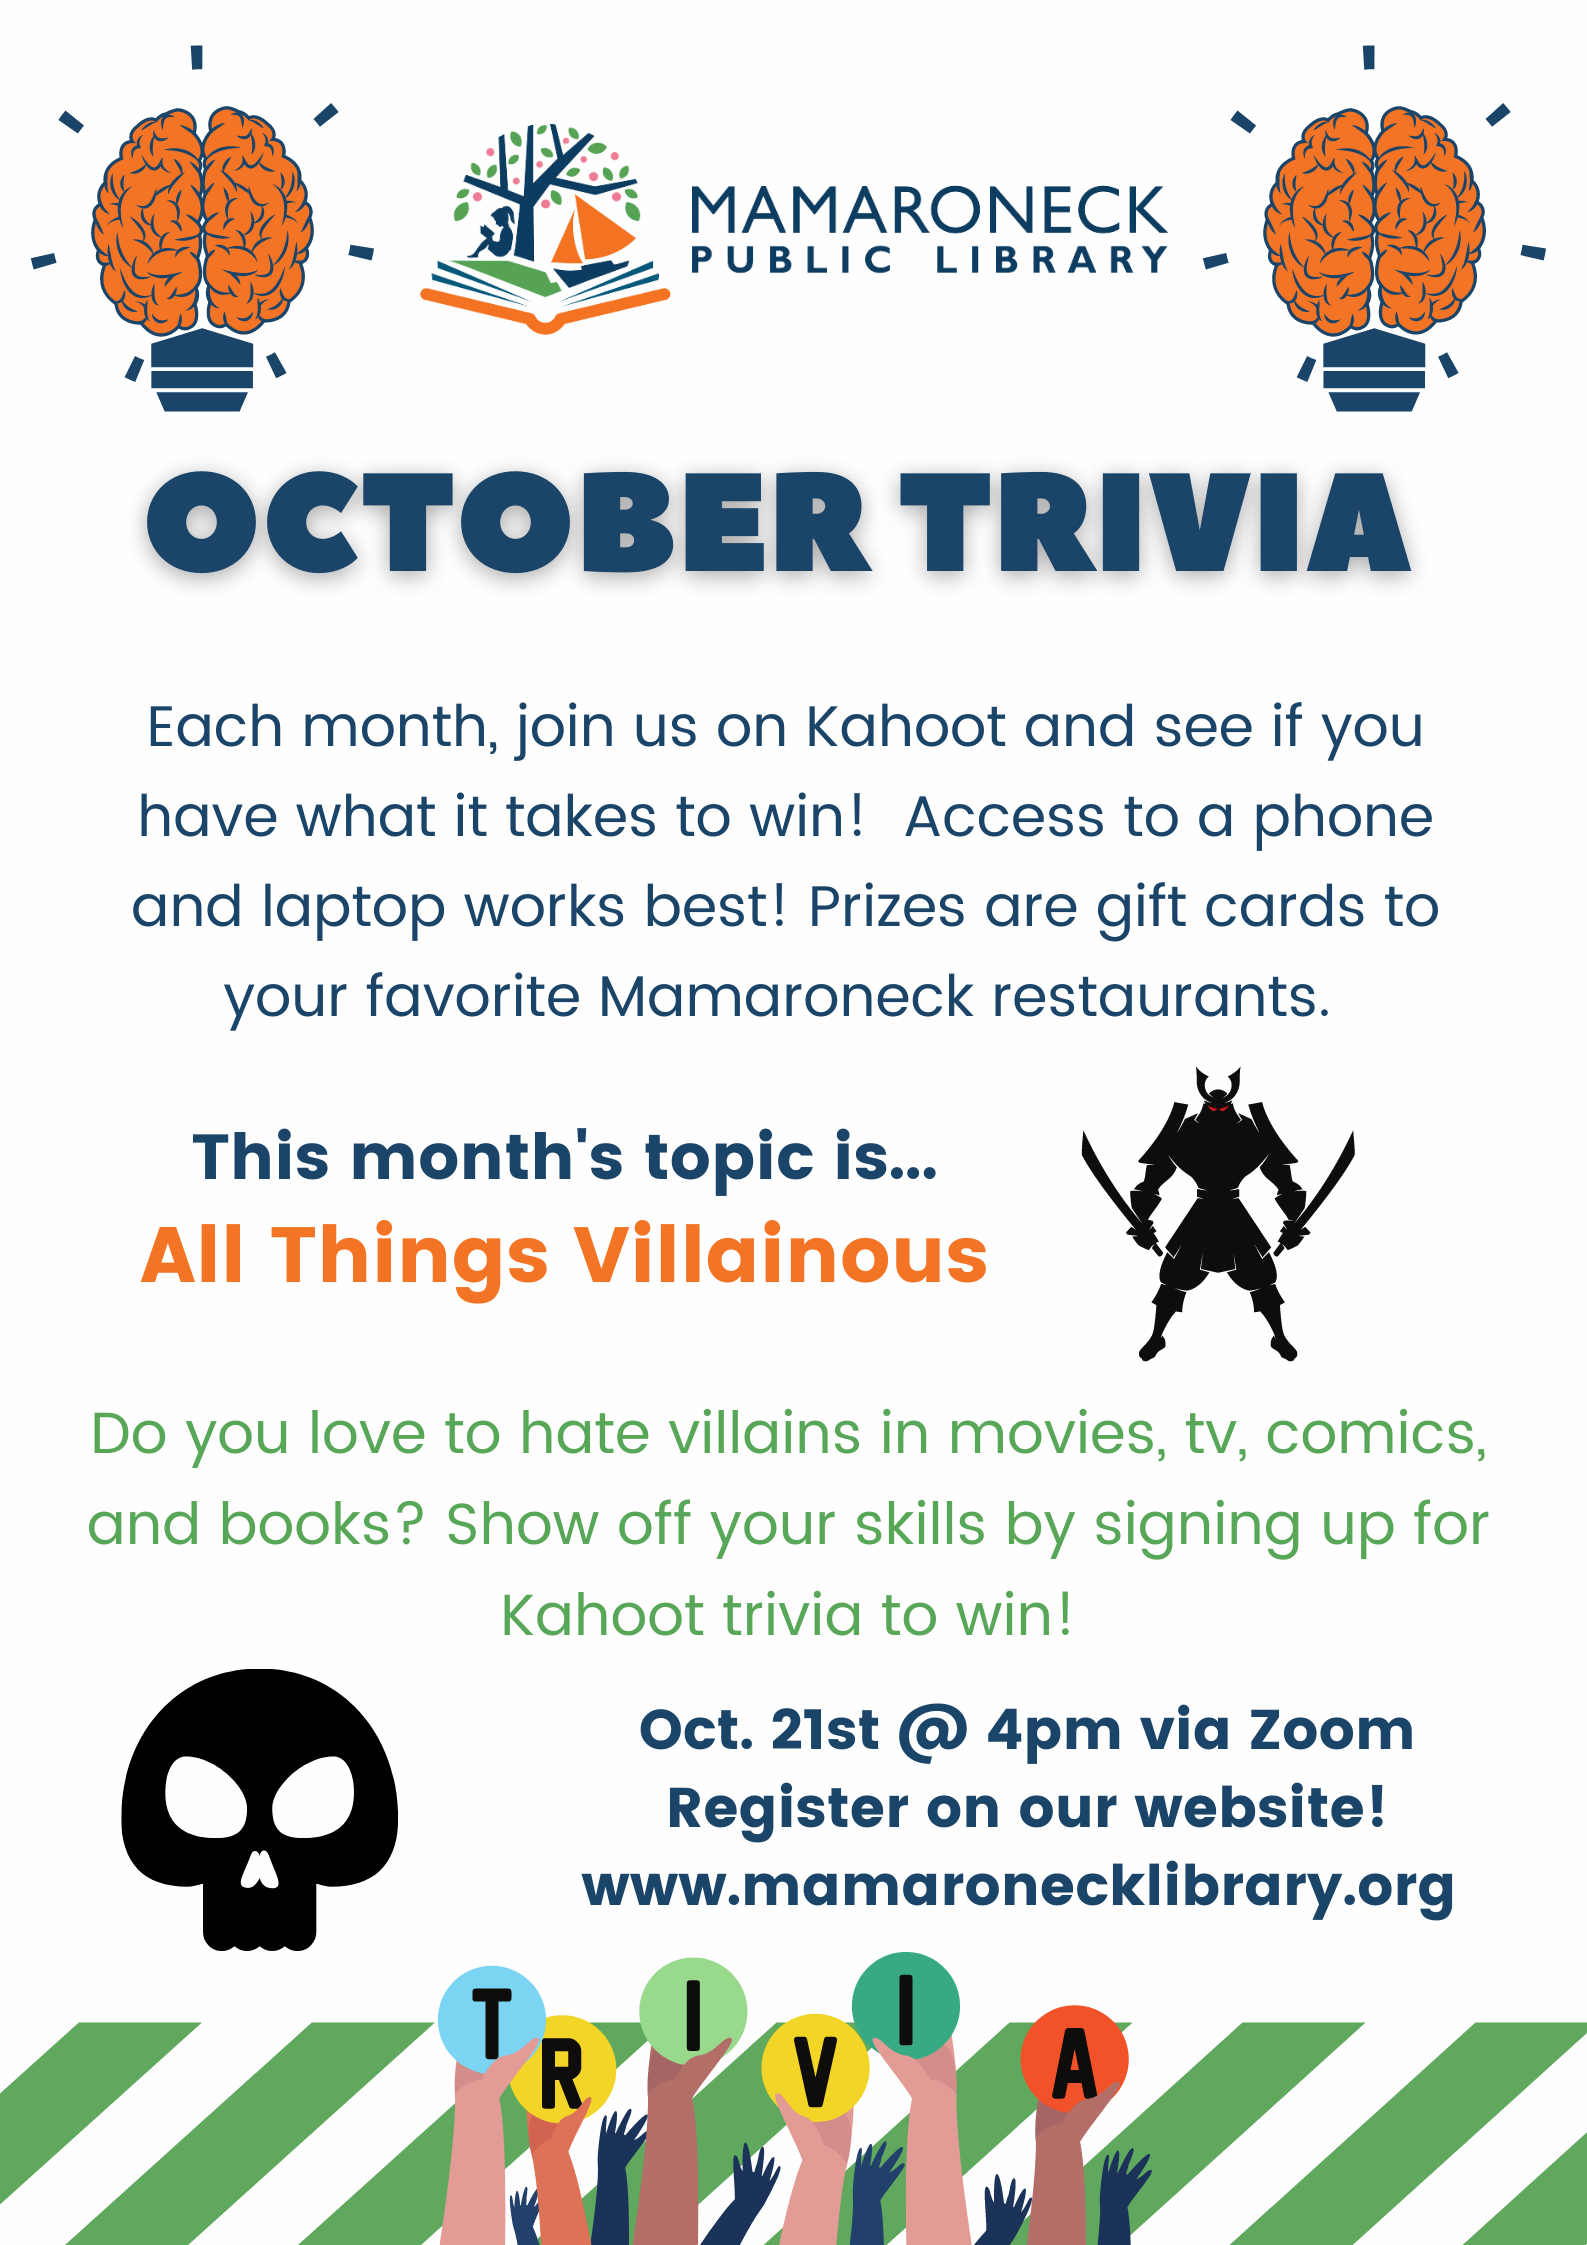 Teen October Trivia contest